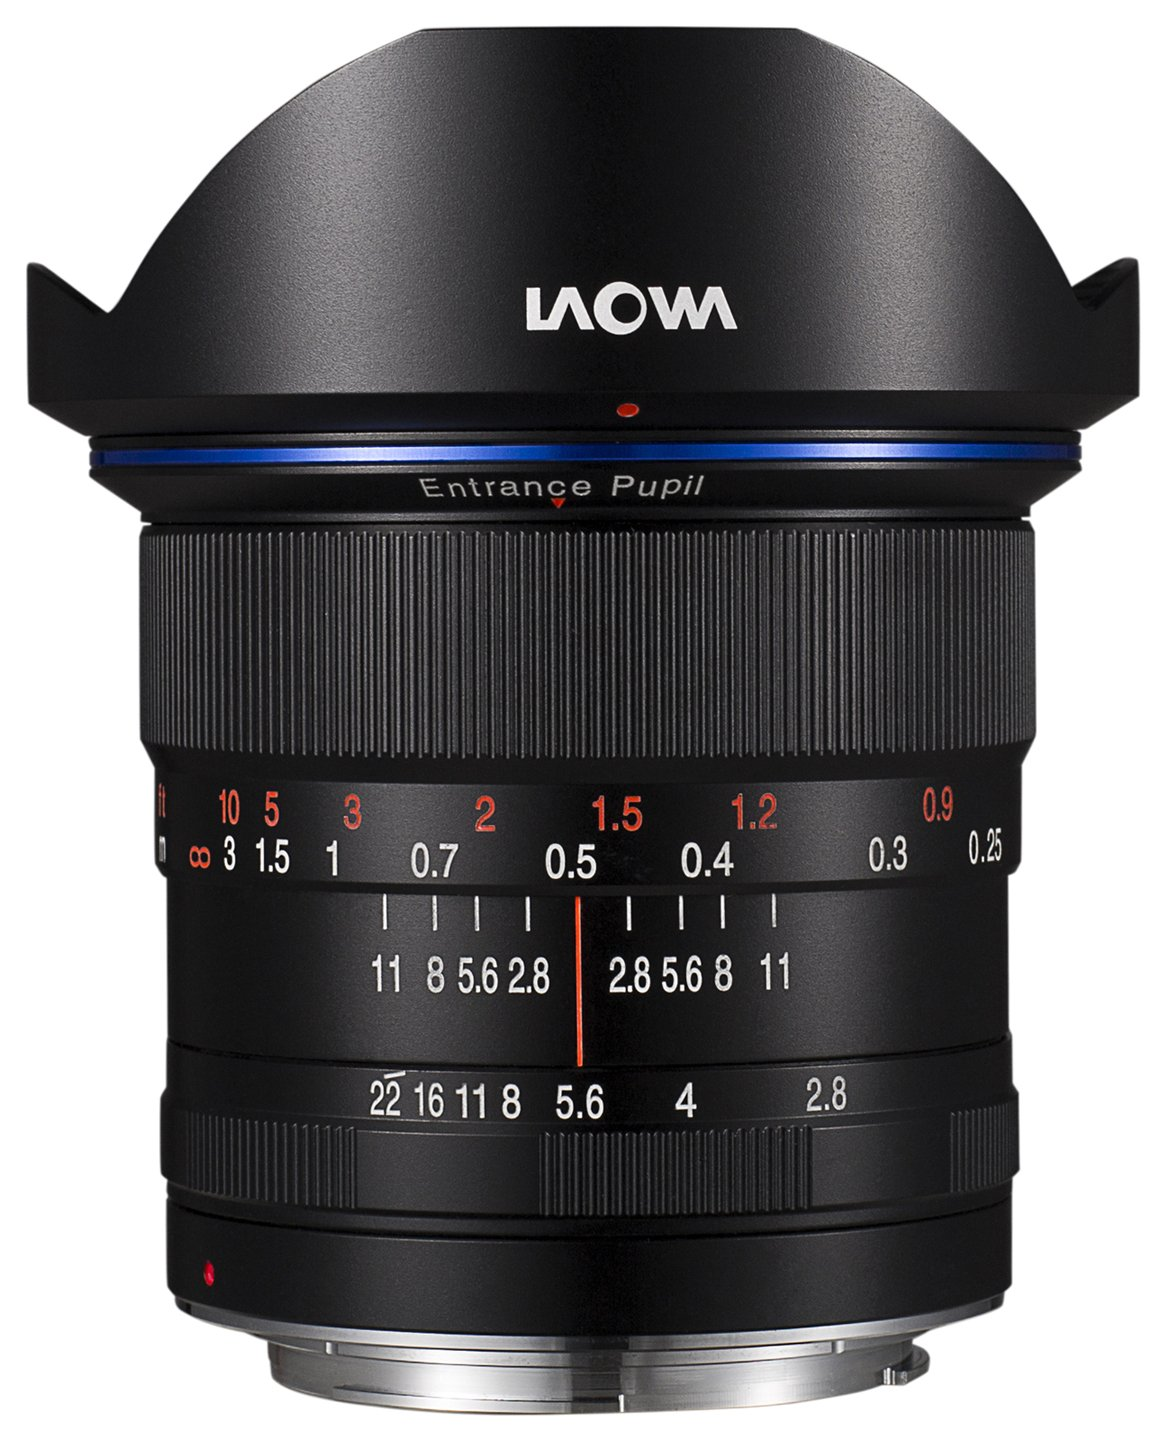 Includes Lens Adapter /& Ring Panasonic Lumix DMC-LX3 0.21x-0.22x High Grade Fish-Eye Lens Nwv Direct Micro Fiber Cleaning Cloth